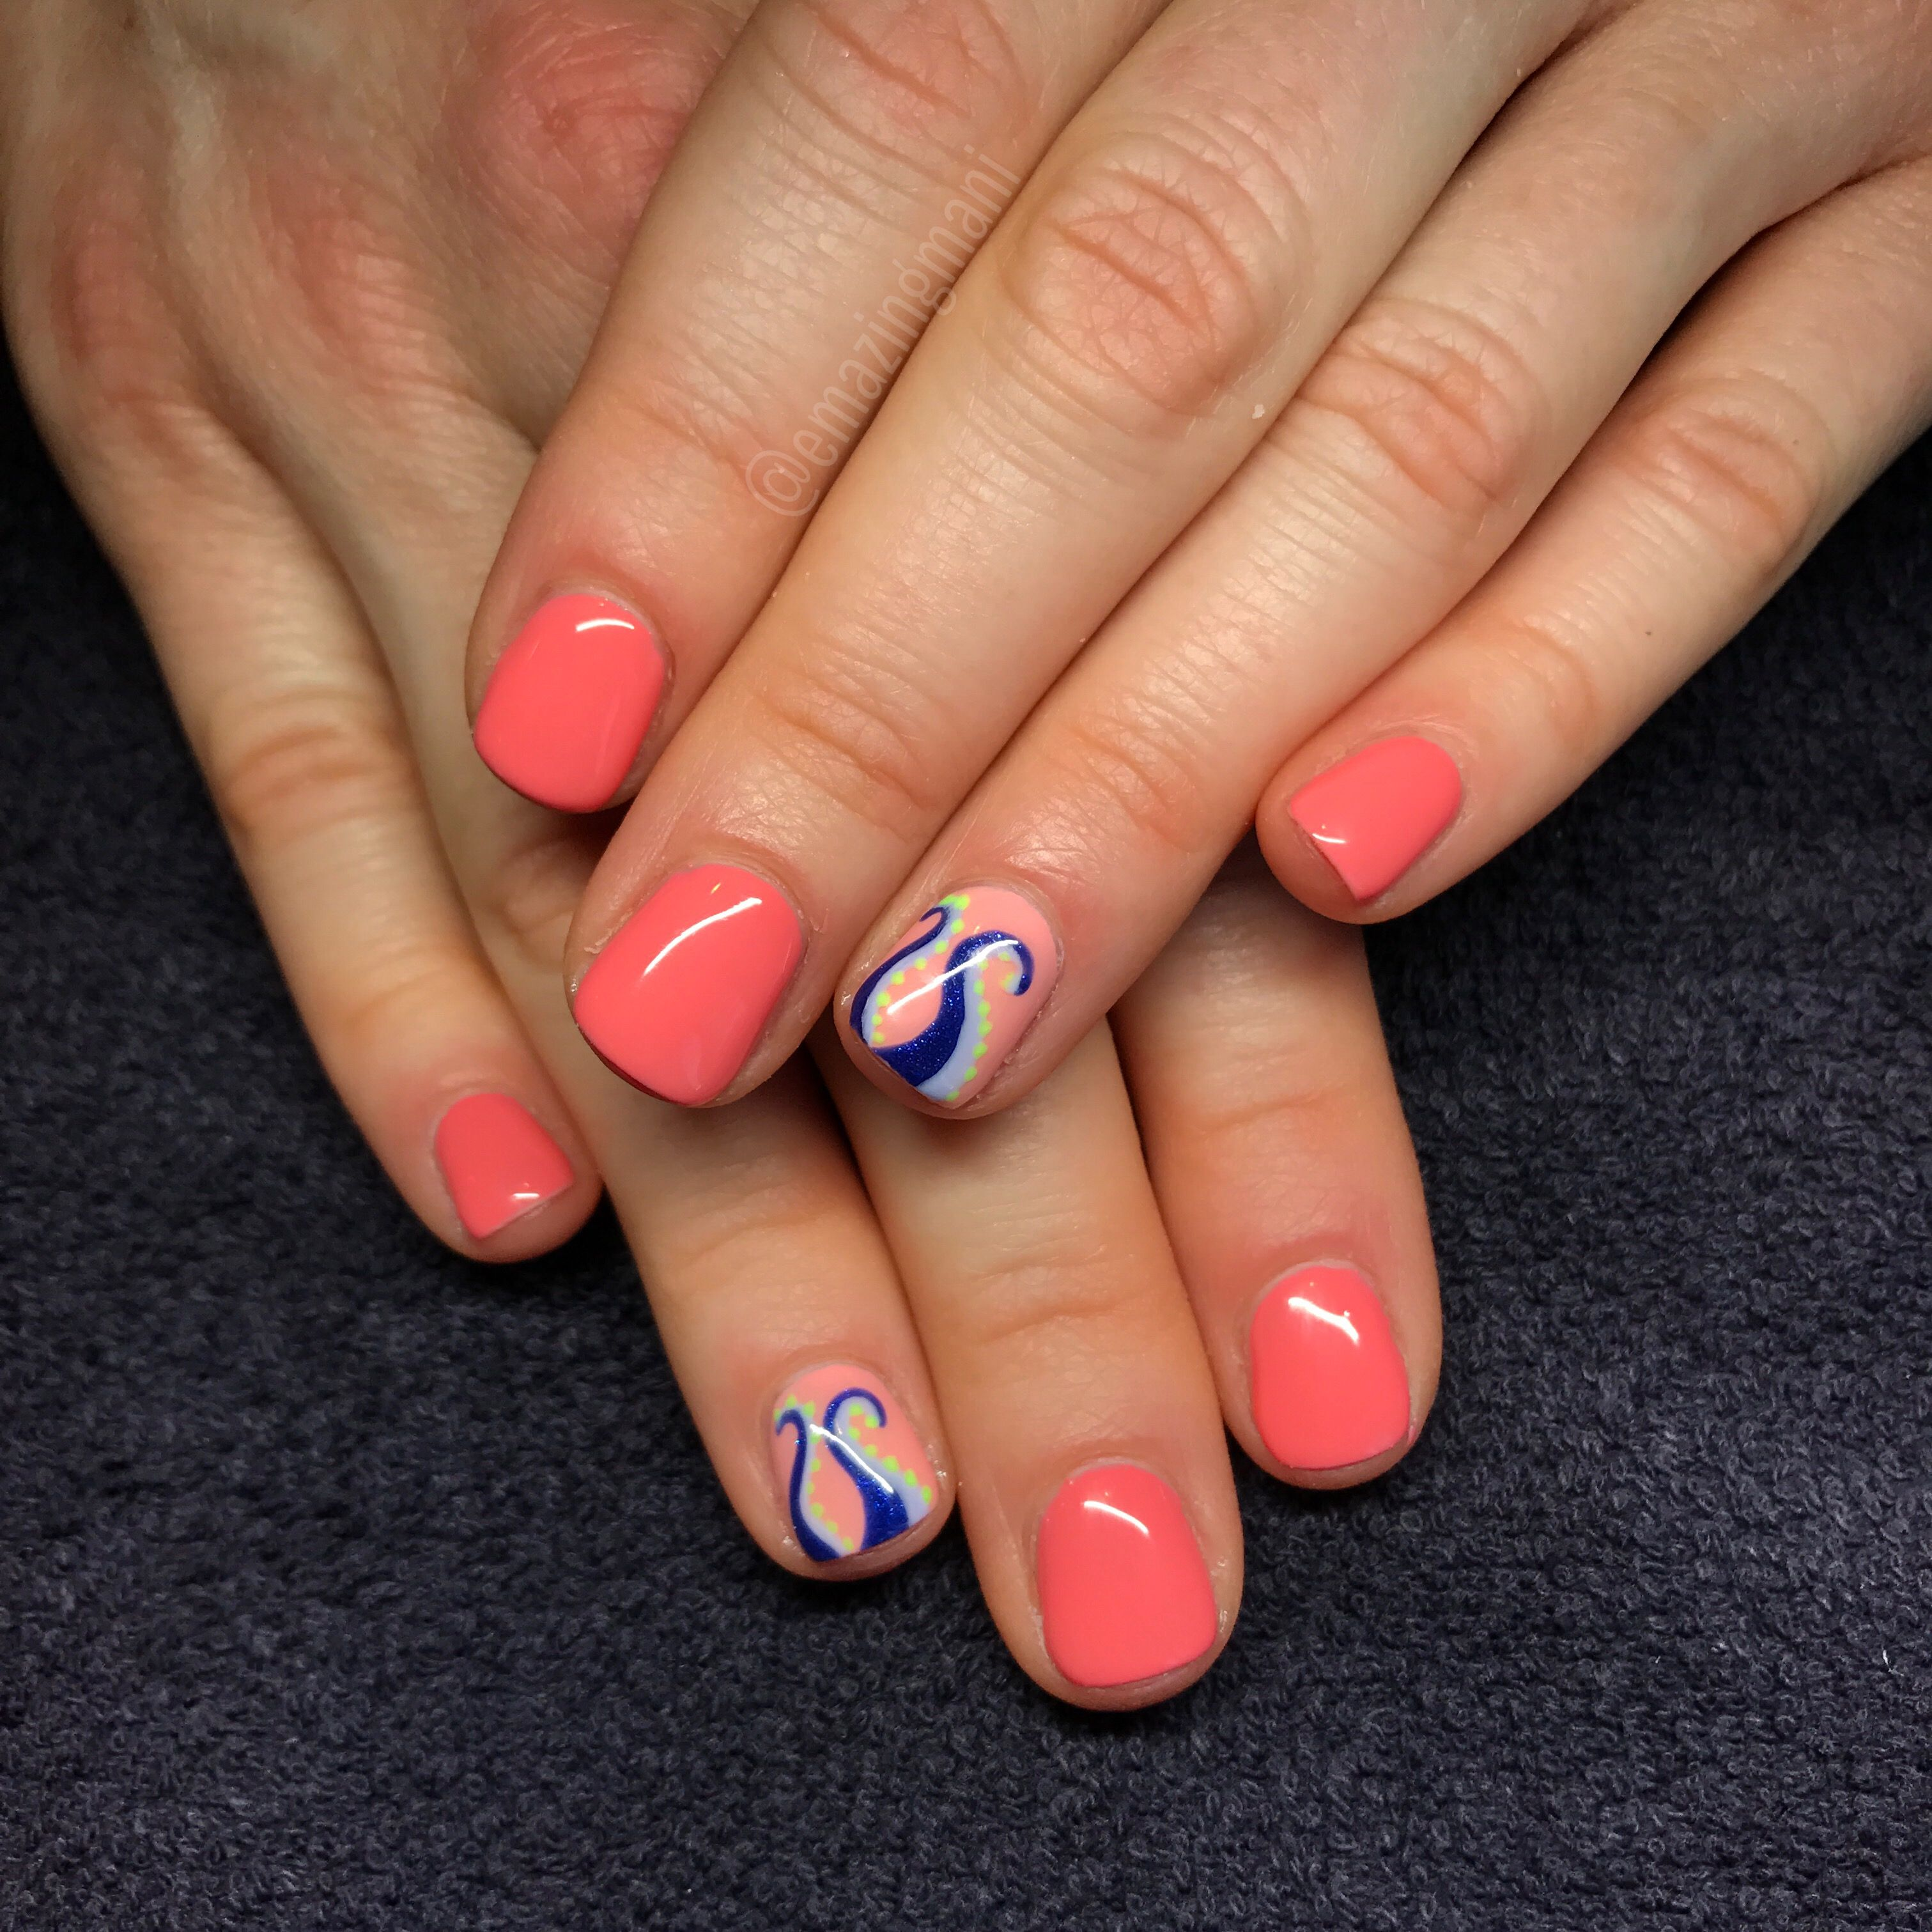 IG @emazingmani Nail art Summer nails Octopus Essie gel peach side ...